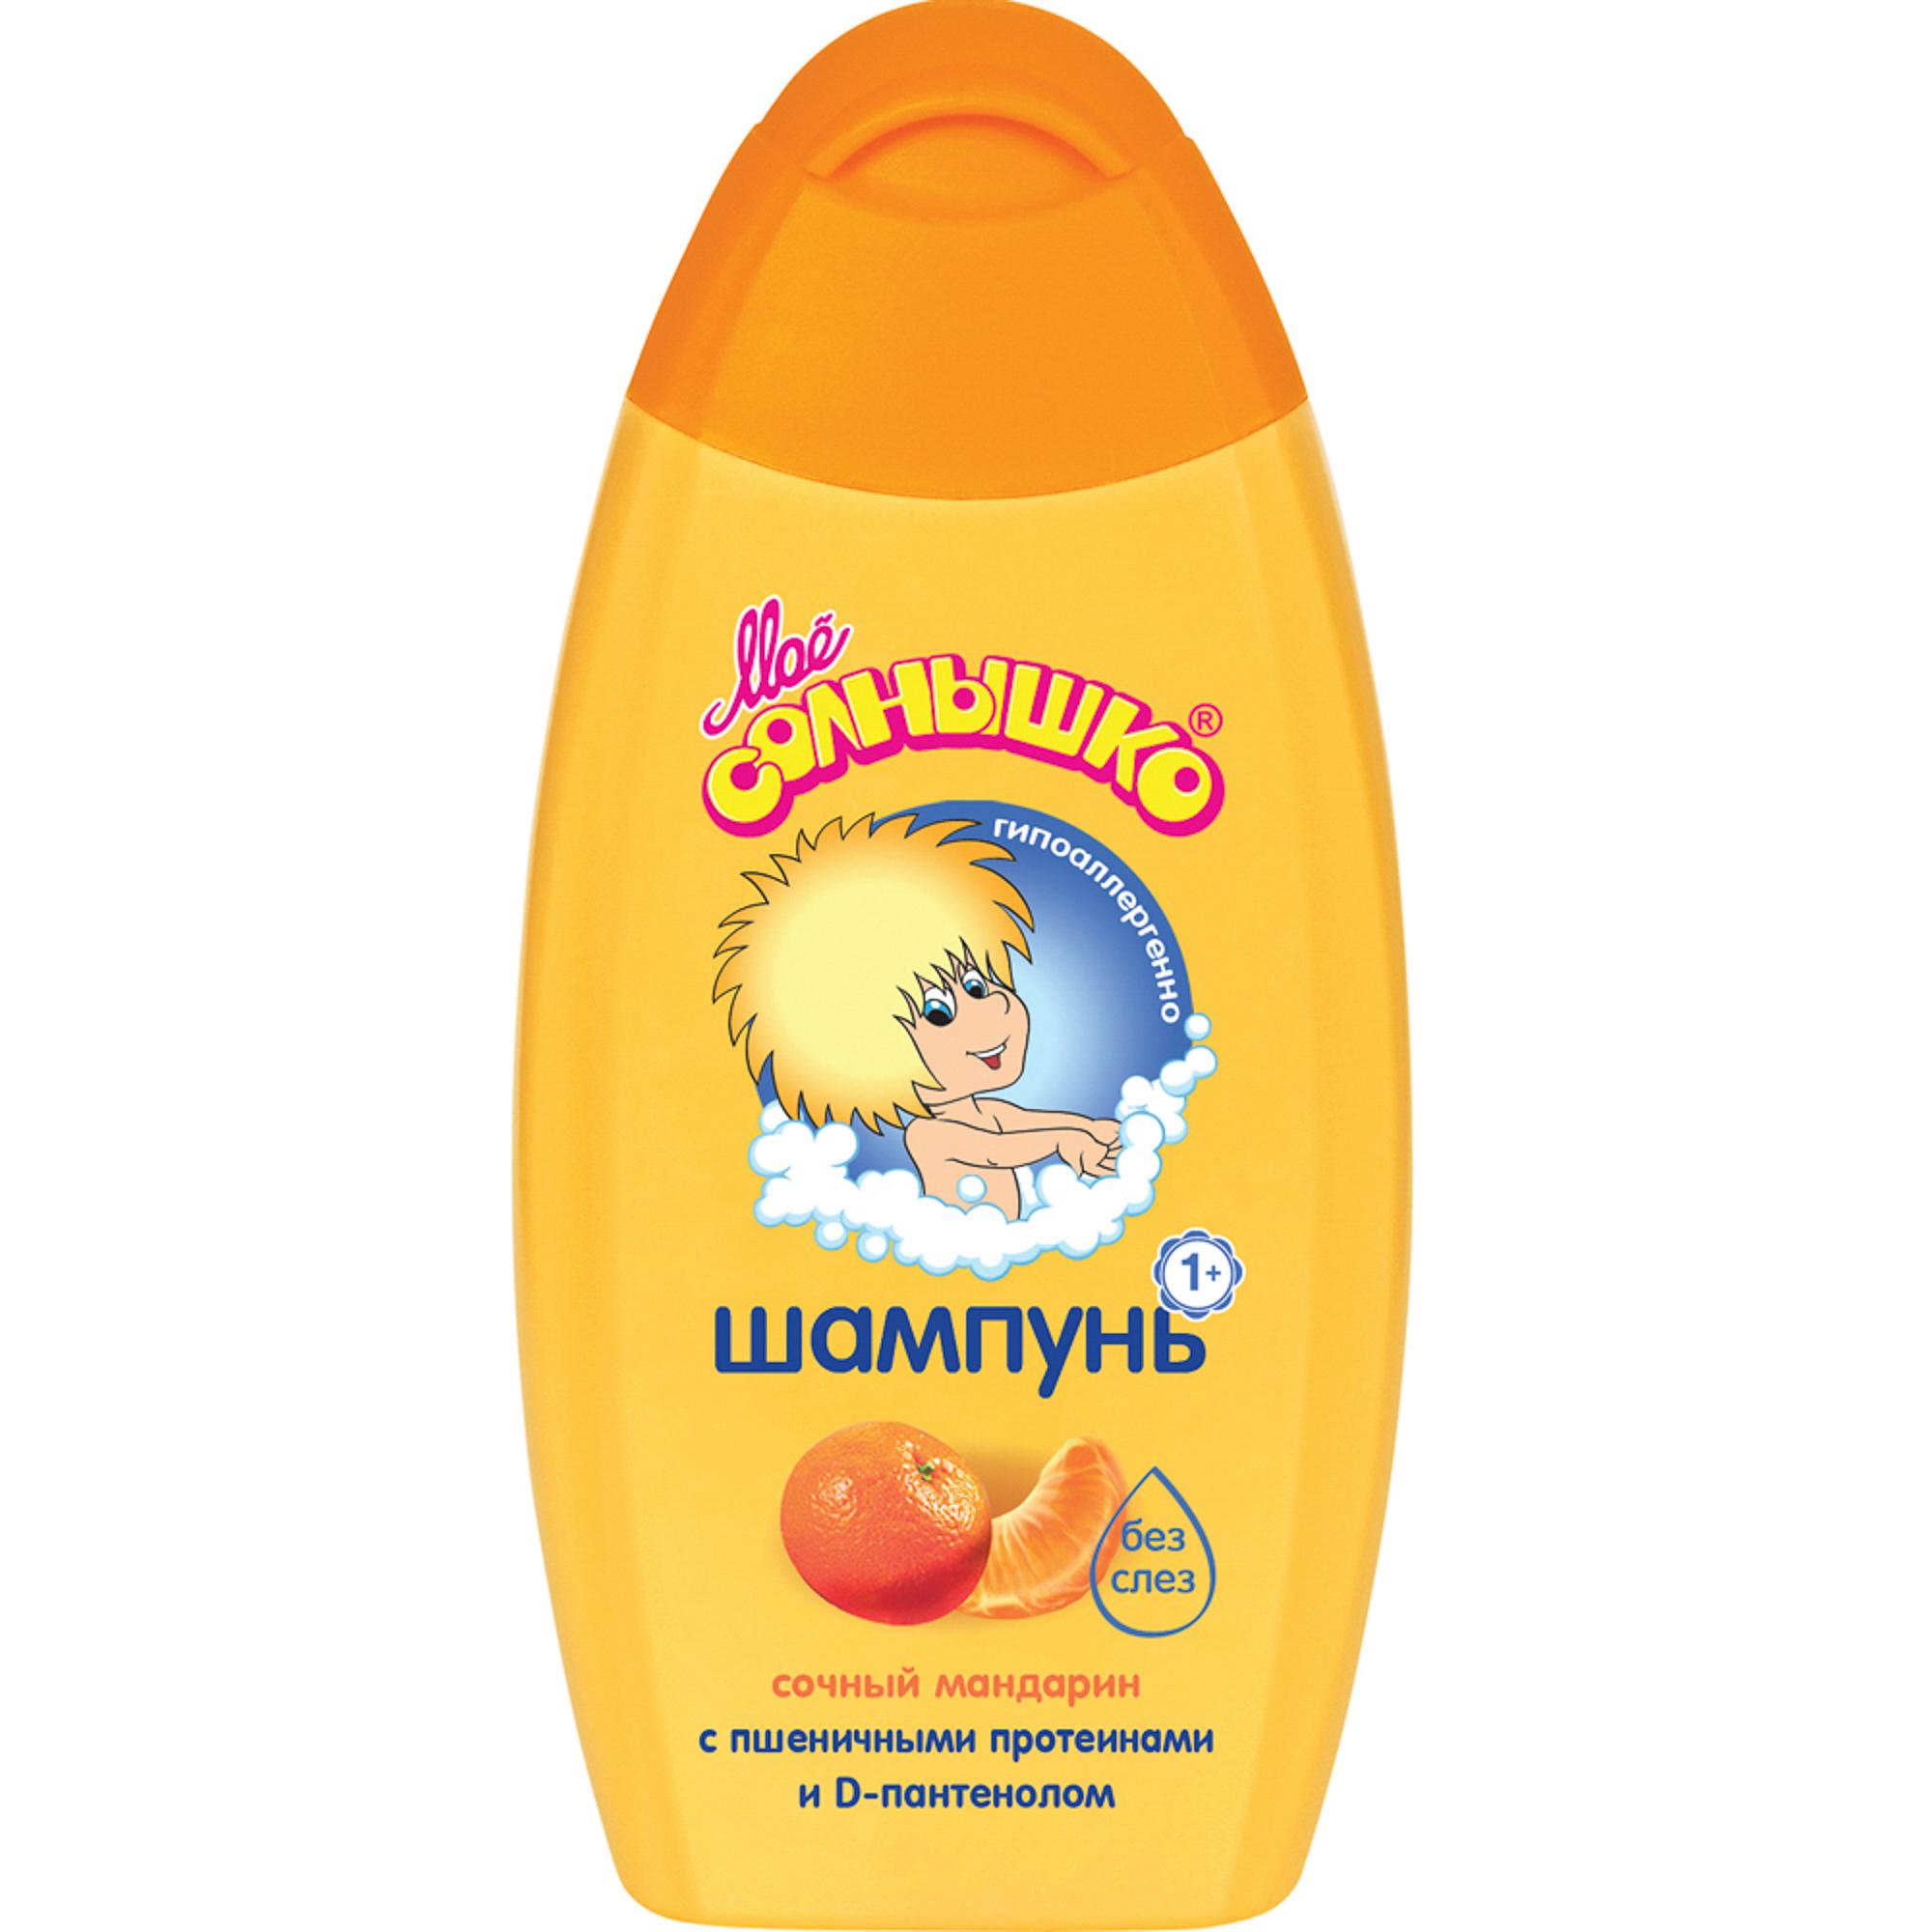 Шампунь Мое солнышко Сочный мандарин 200 мл мое солнышко шампунь сочный мандарин без слез 200мл